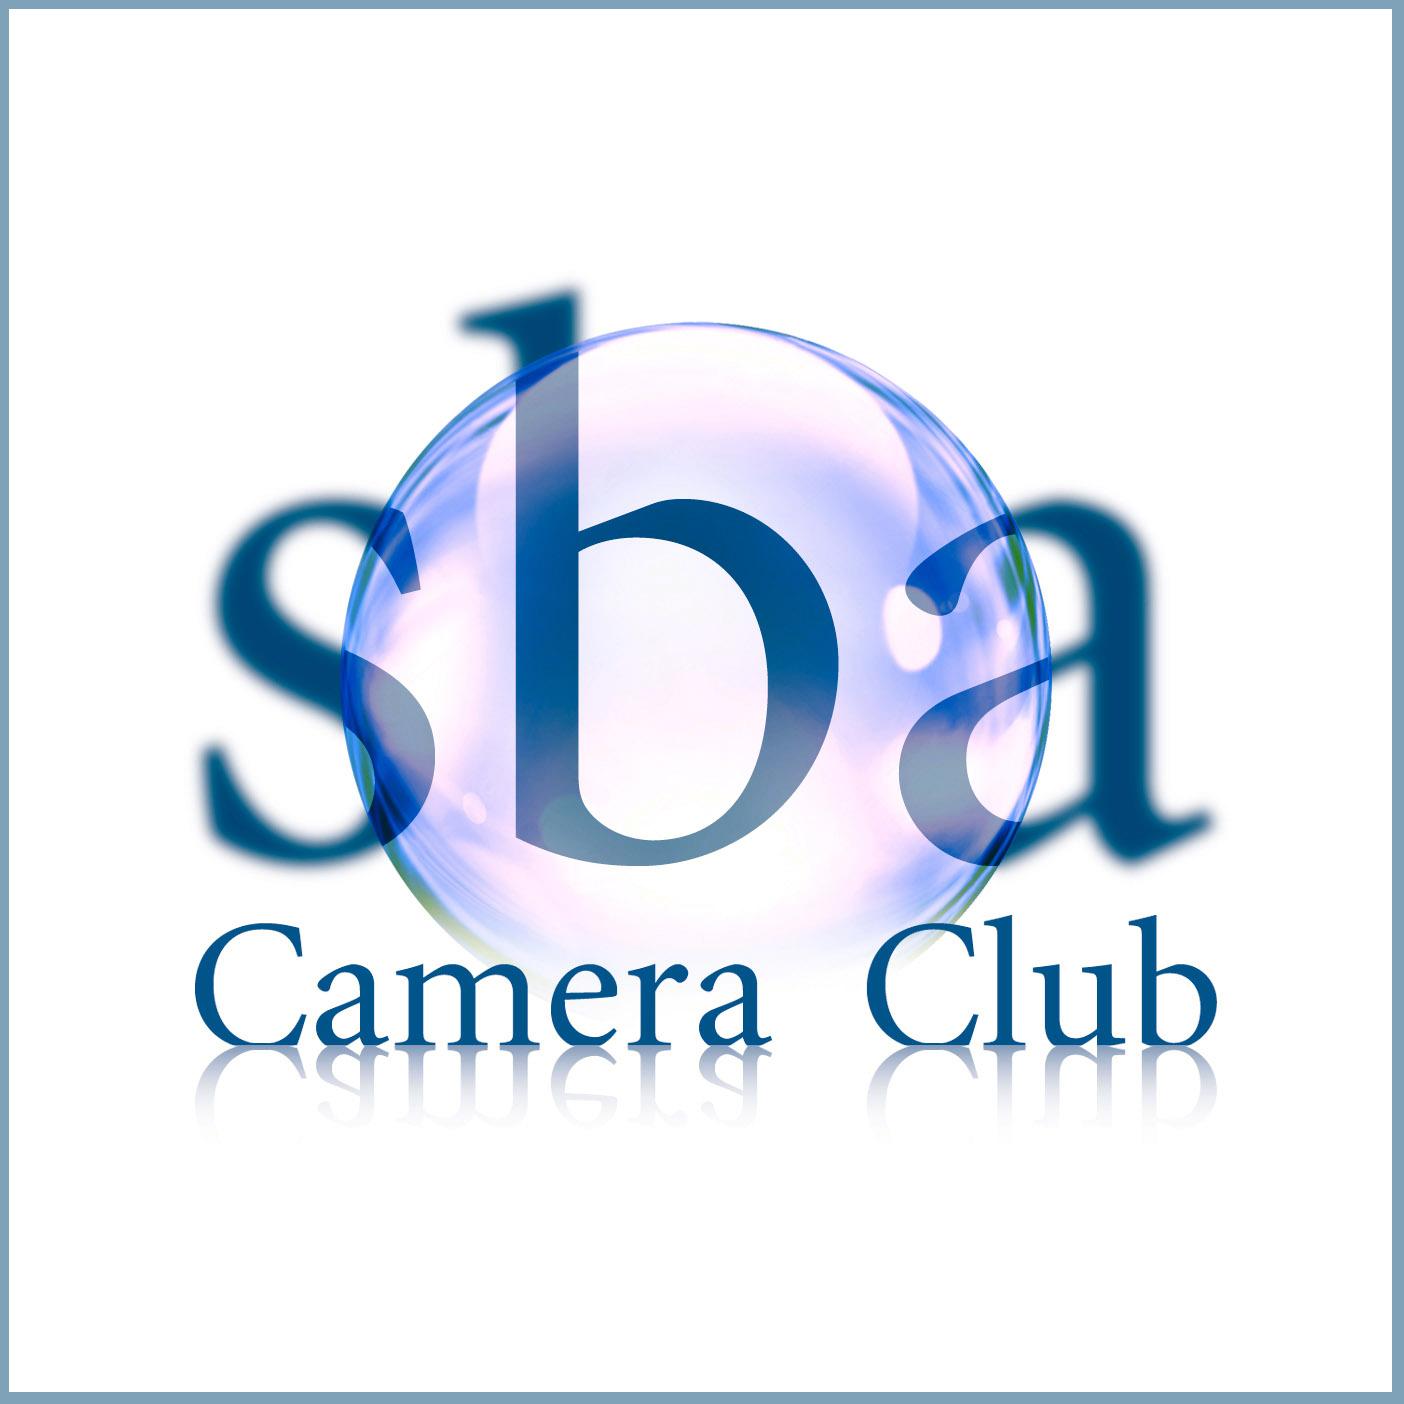 SBA Camera Club